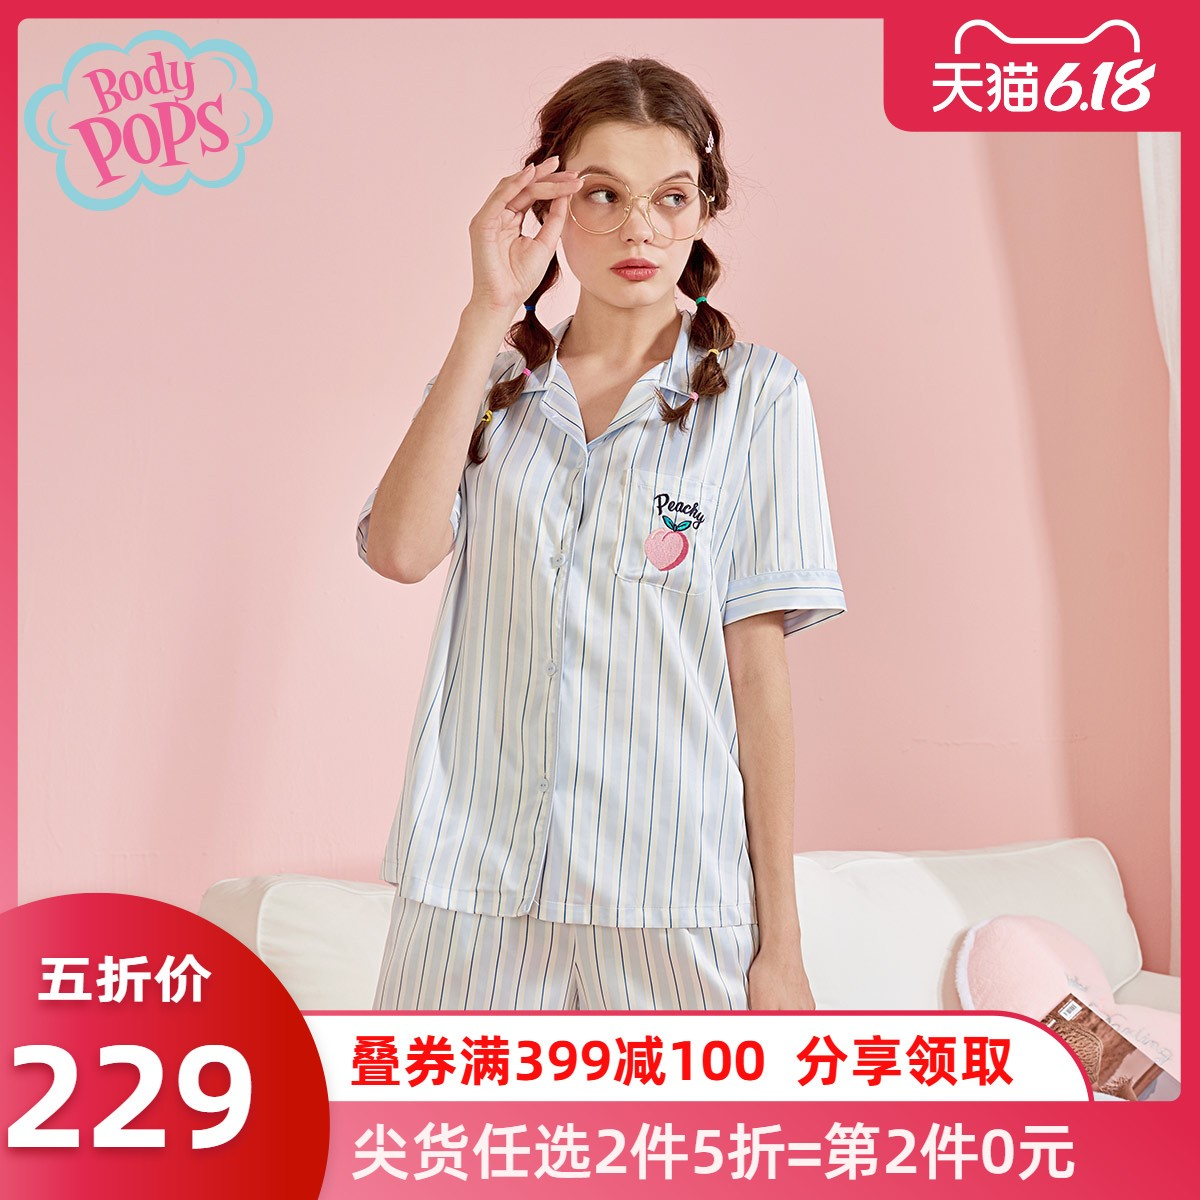 bodypops衣恋20年冰丝睡衣女春秋可爱条纹家居服短袖短裤两件套夏